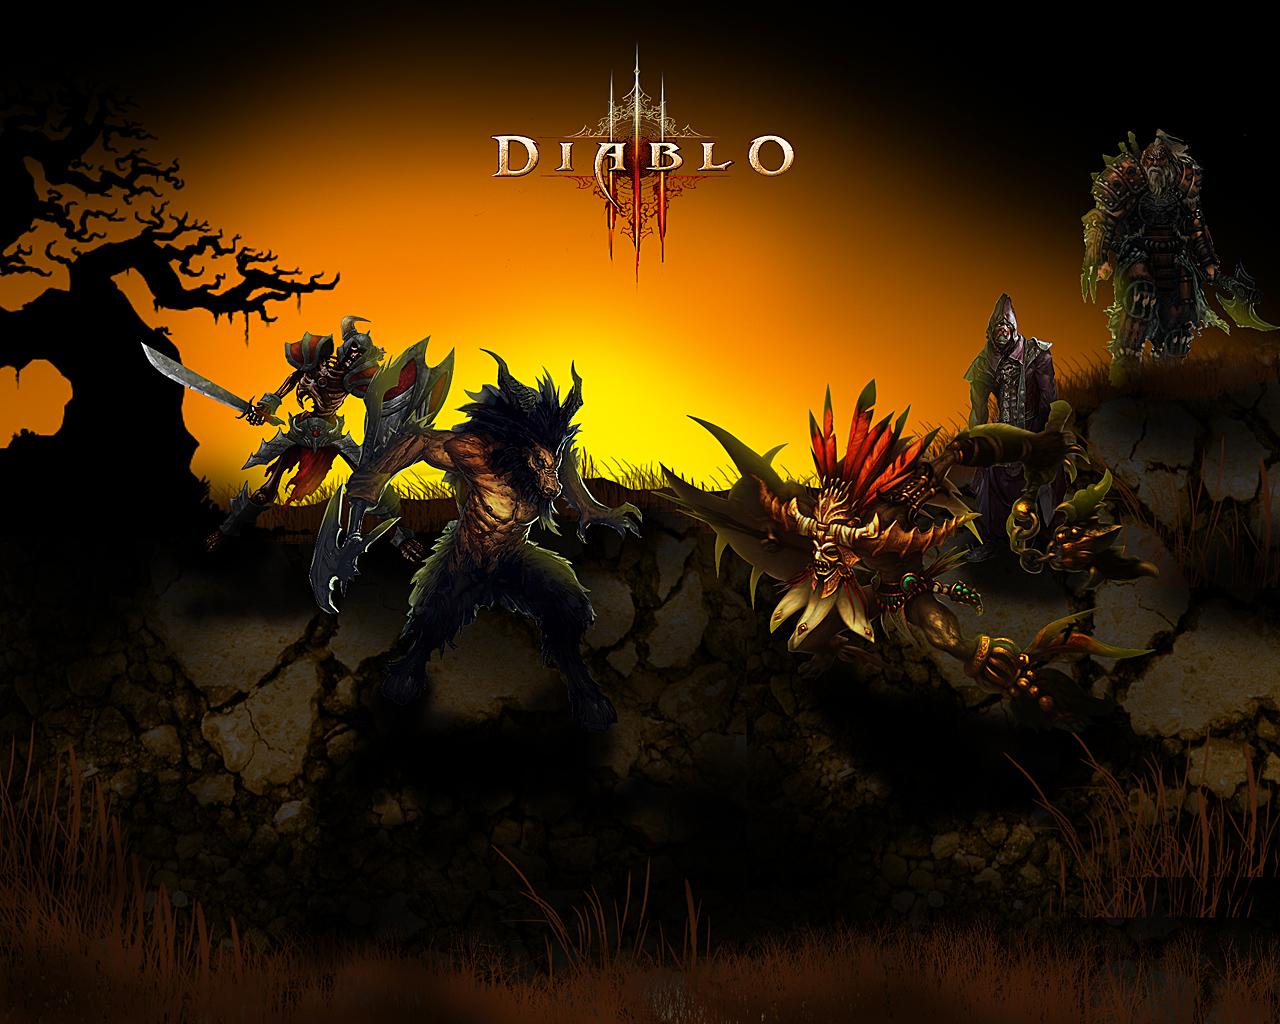 http://3.bp.blogspot.com/-7do_cJZUuRA/TuKDl_YDX8I/AAAAAAAAEVU/jJYBsGN5hXw/s1600/Diablo+3+Wallpapers.jpg